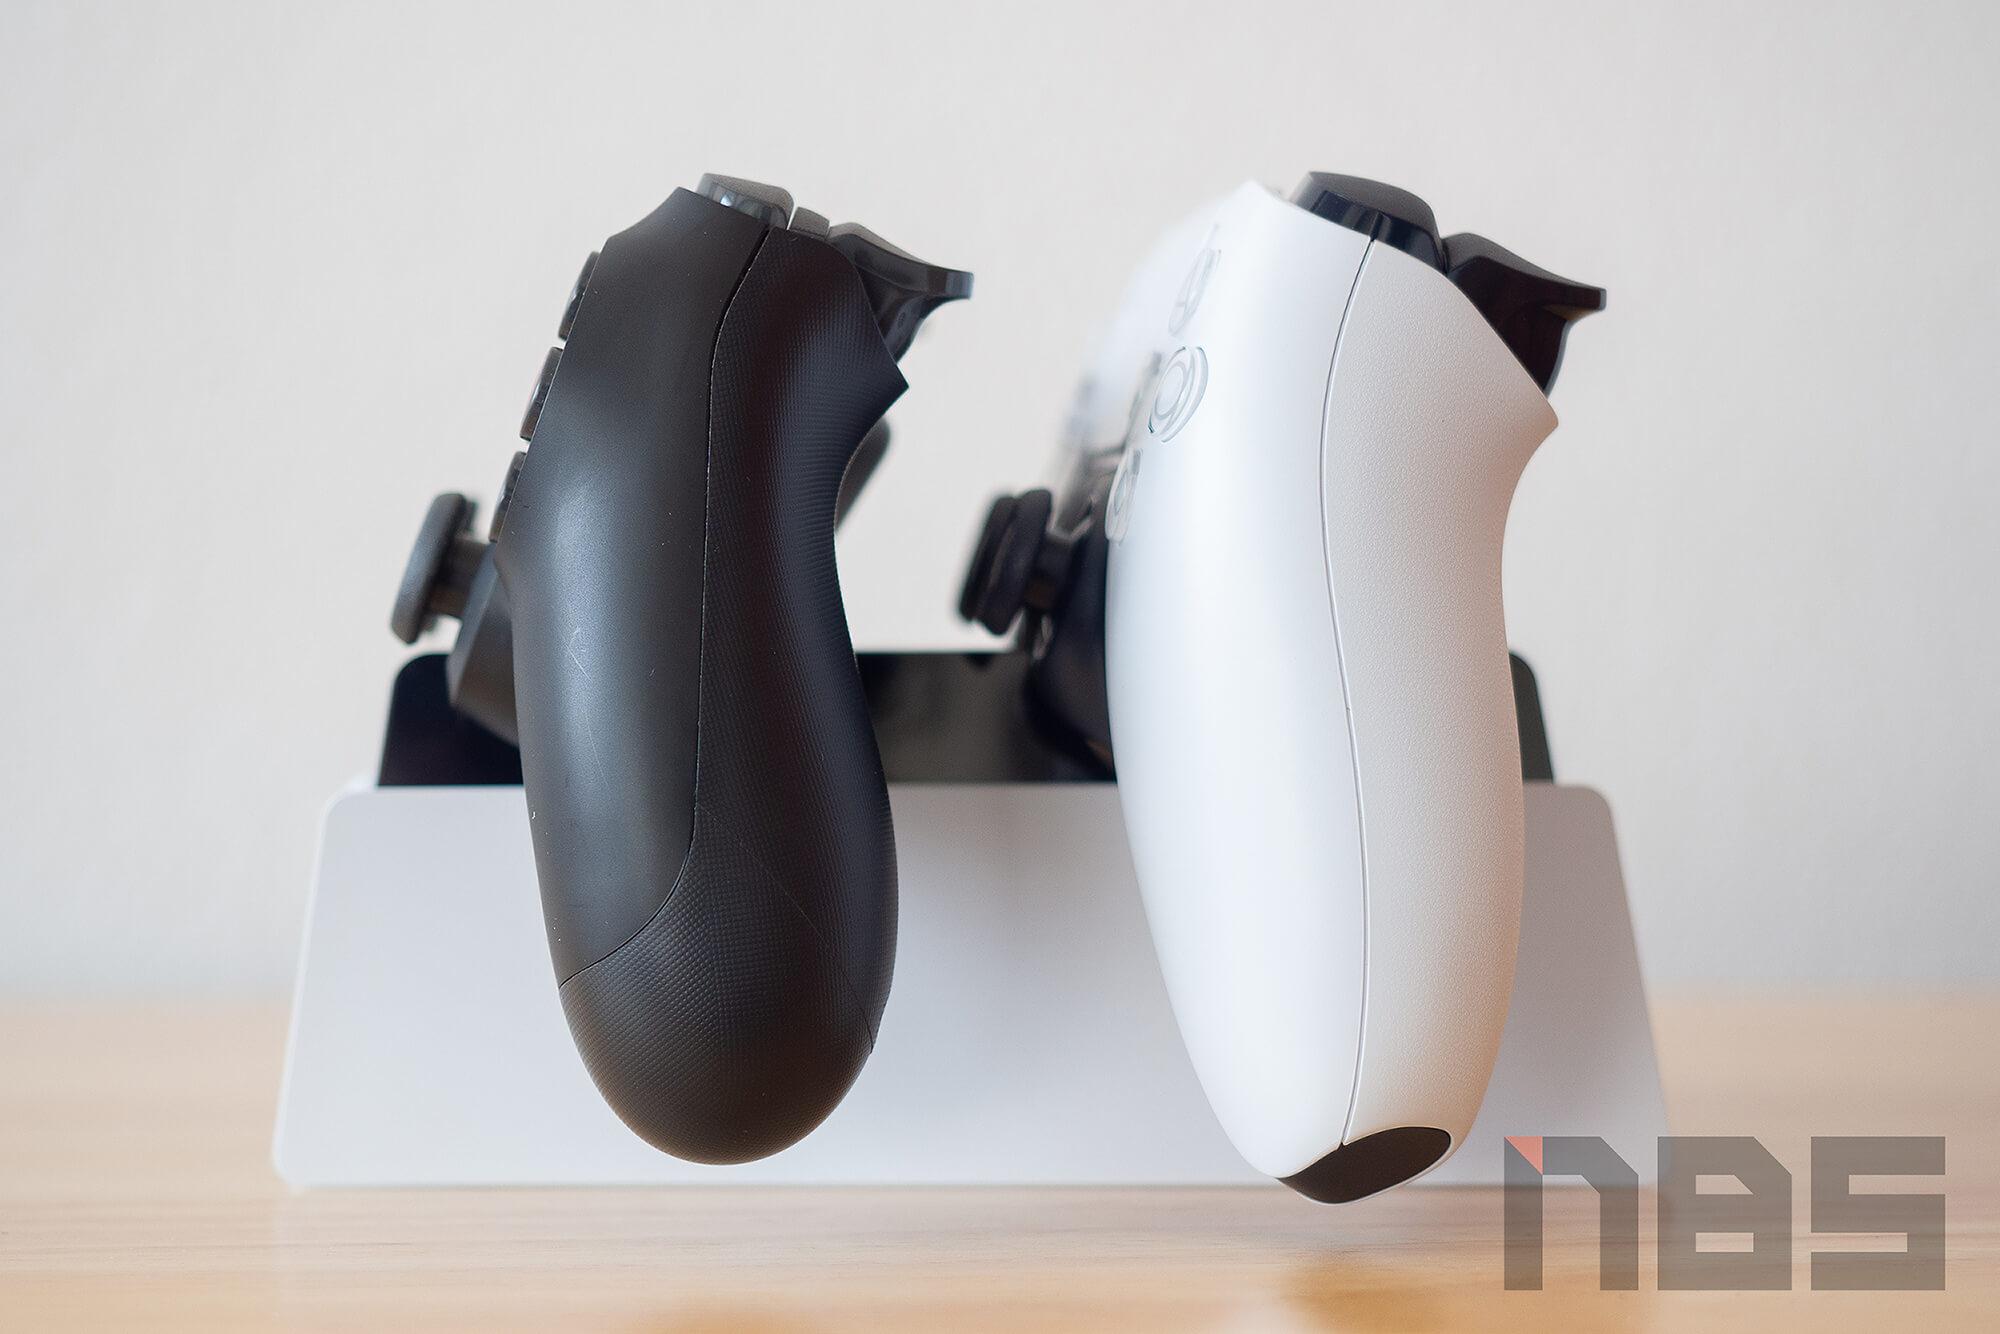 Review PlayStation 5 DualSense Charging Station NotebookSPEC 12